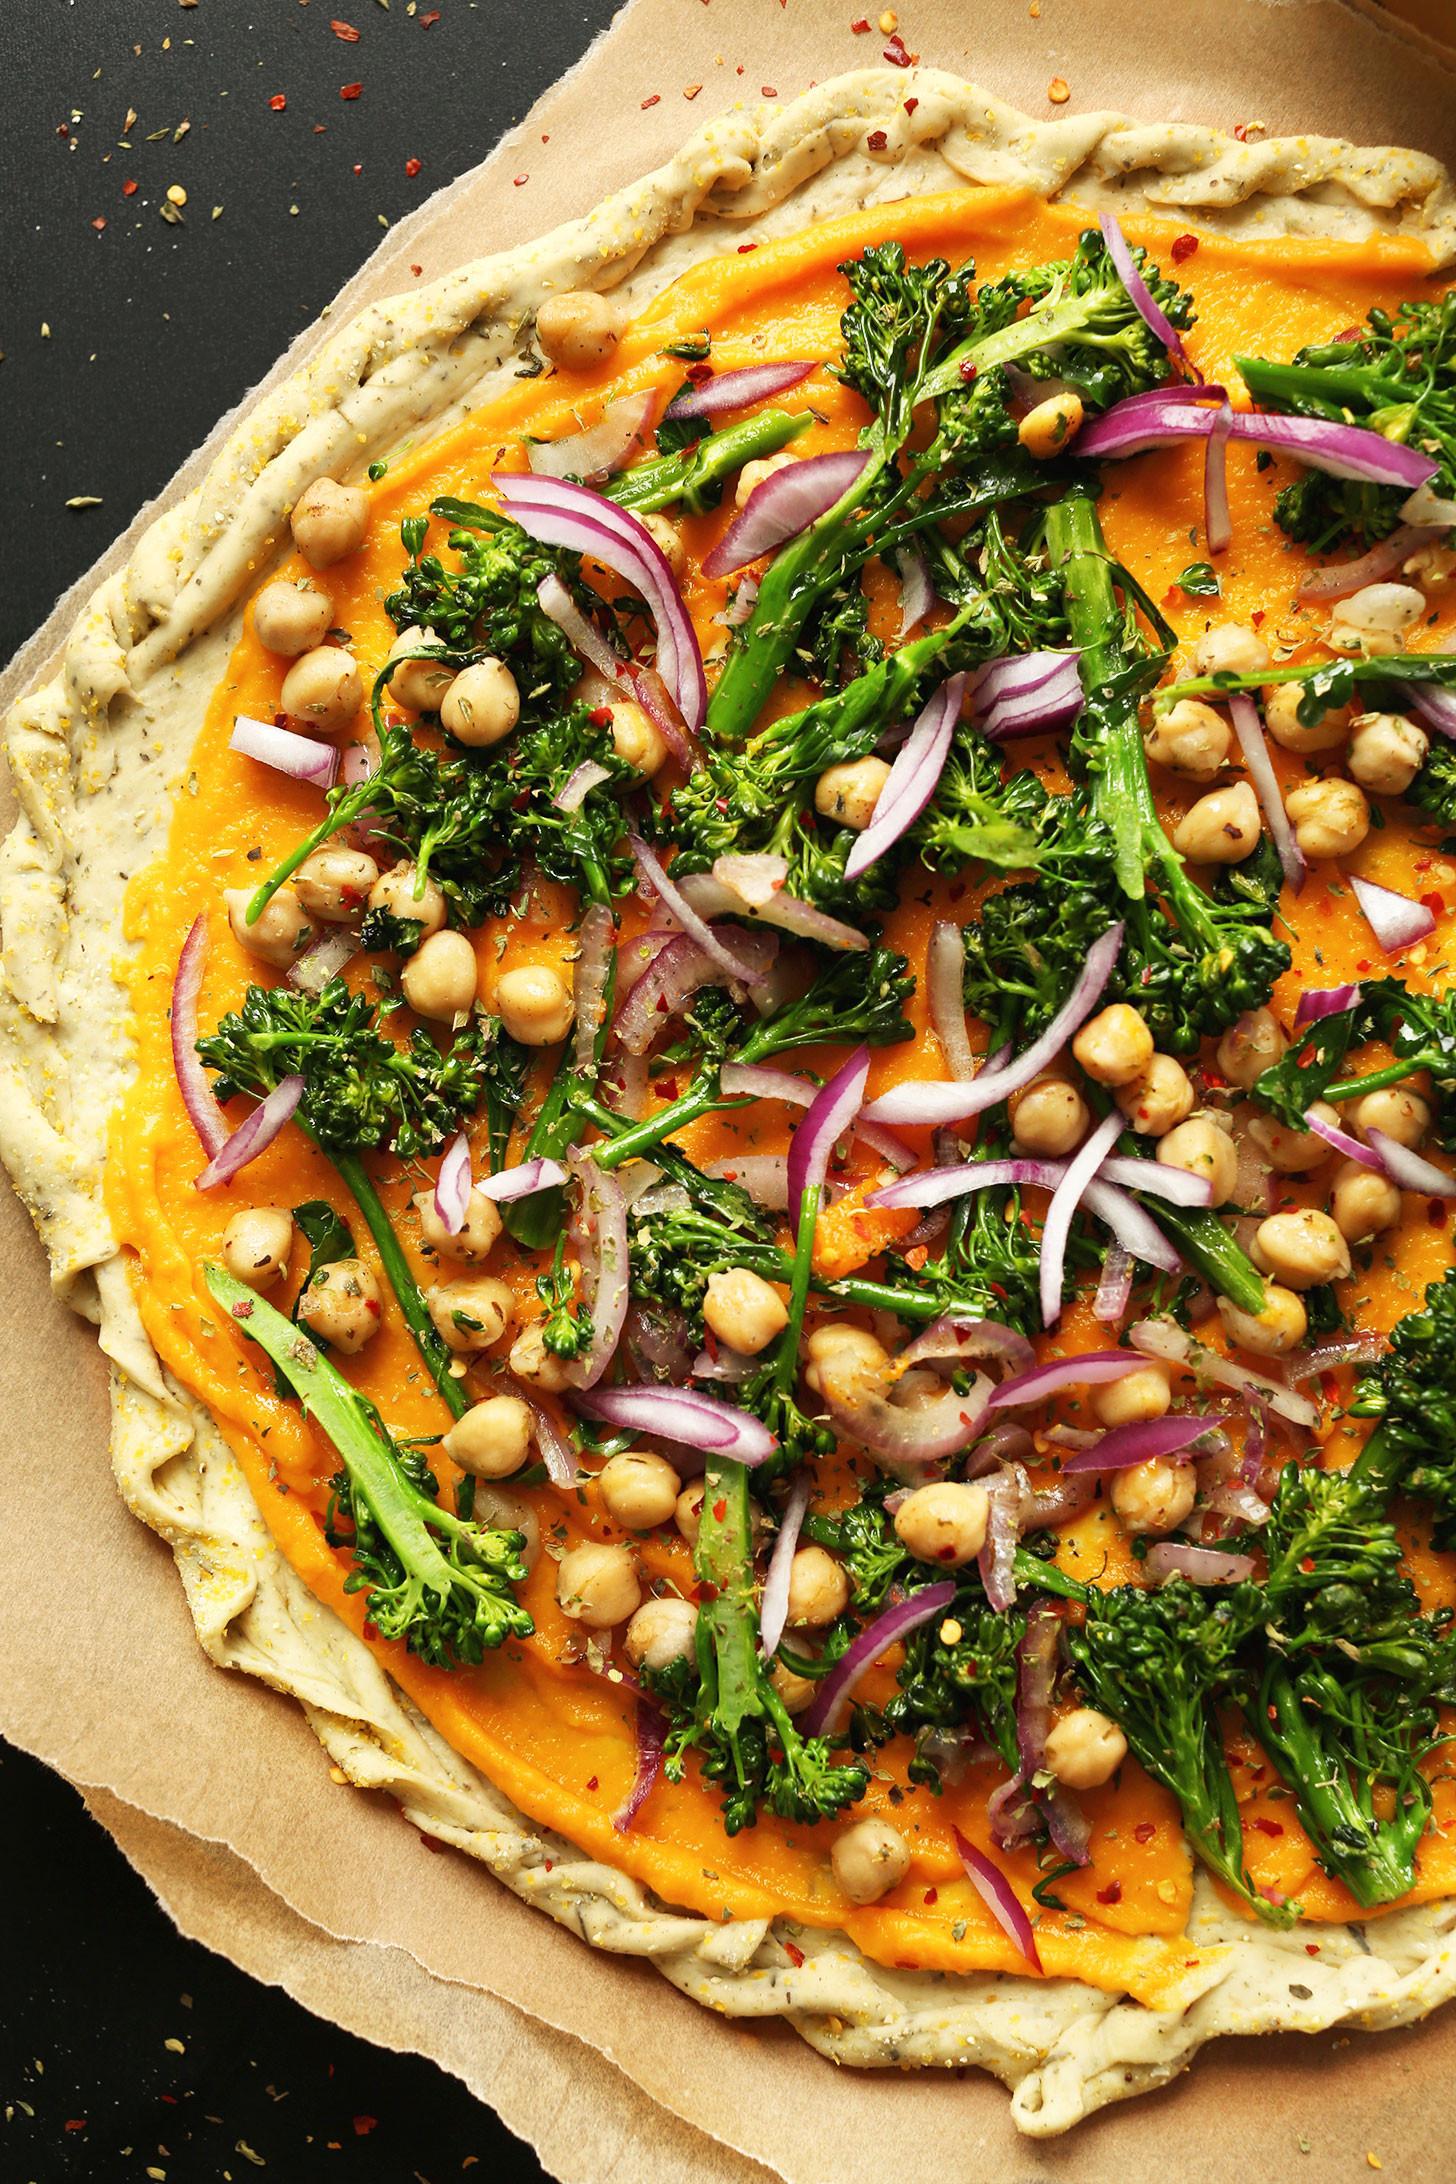 Vegan Healthy Dinner Recipes  30 delicious vegan dinner recipes for happy tummies